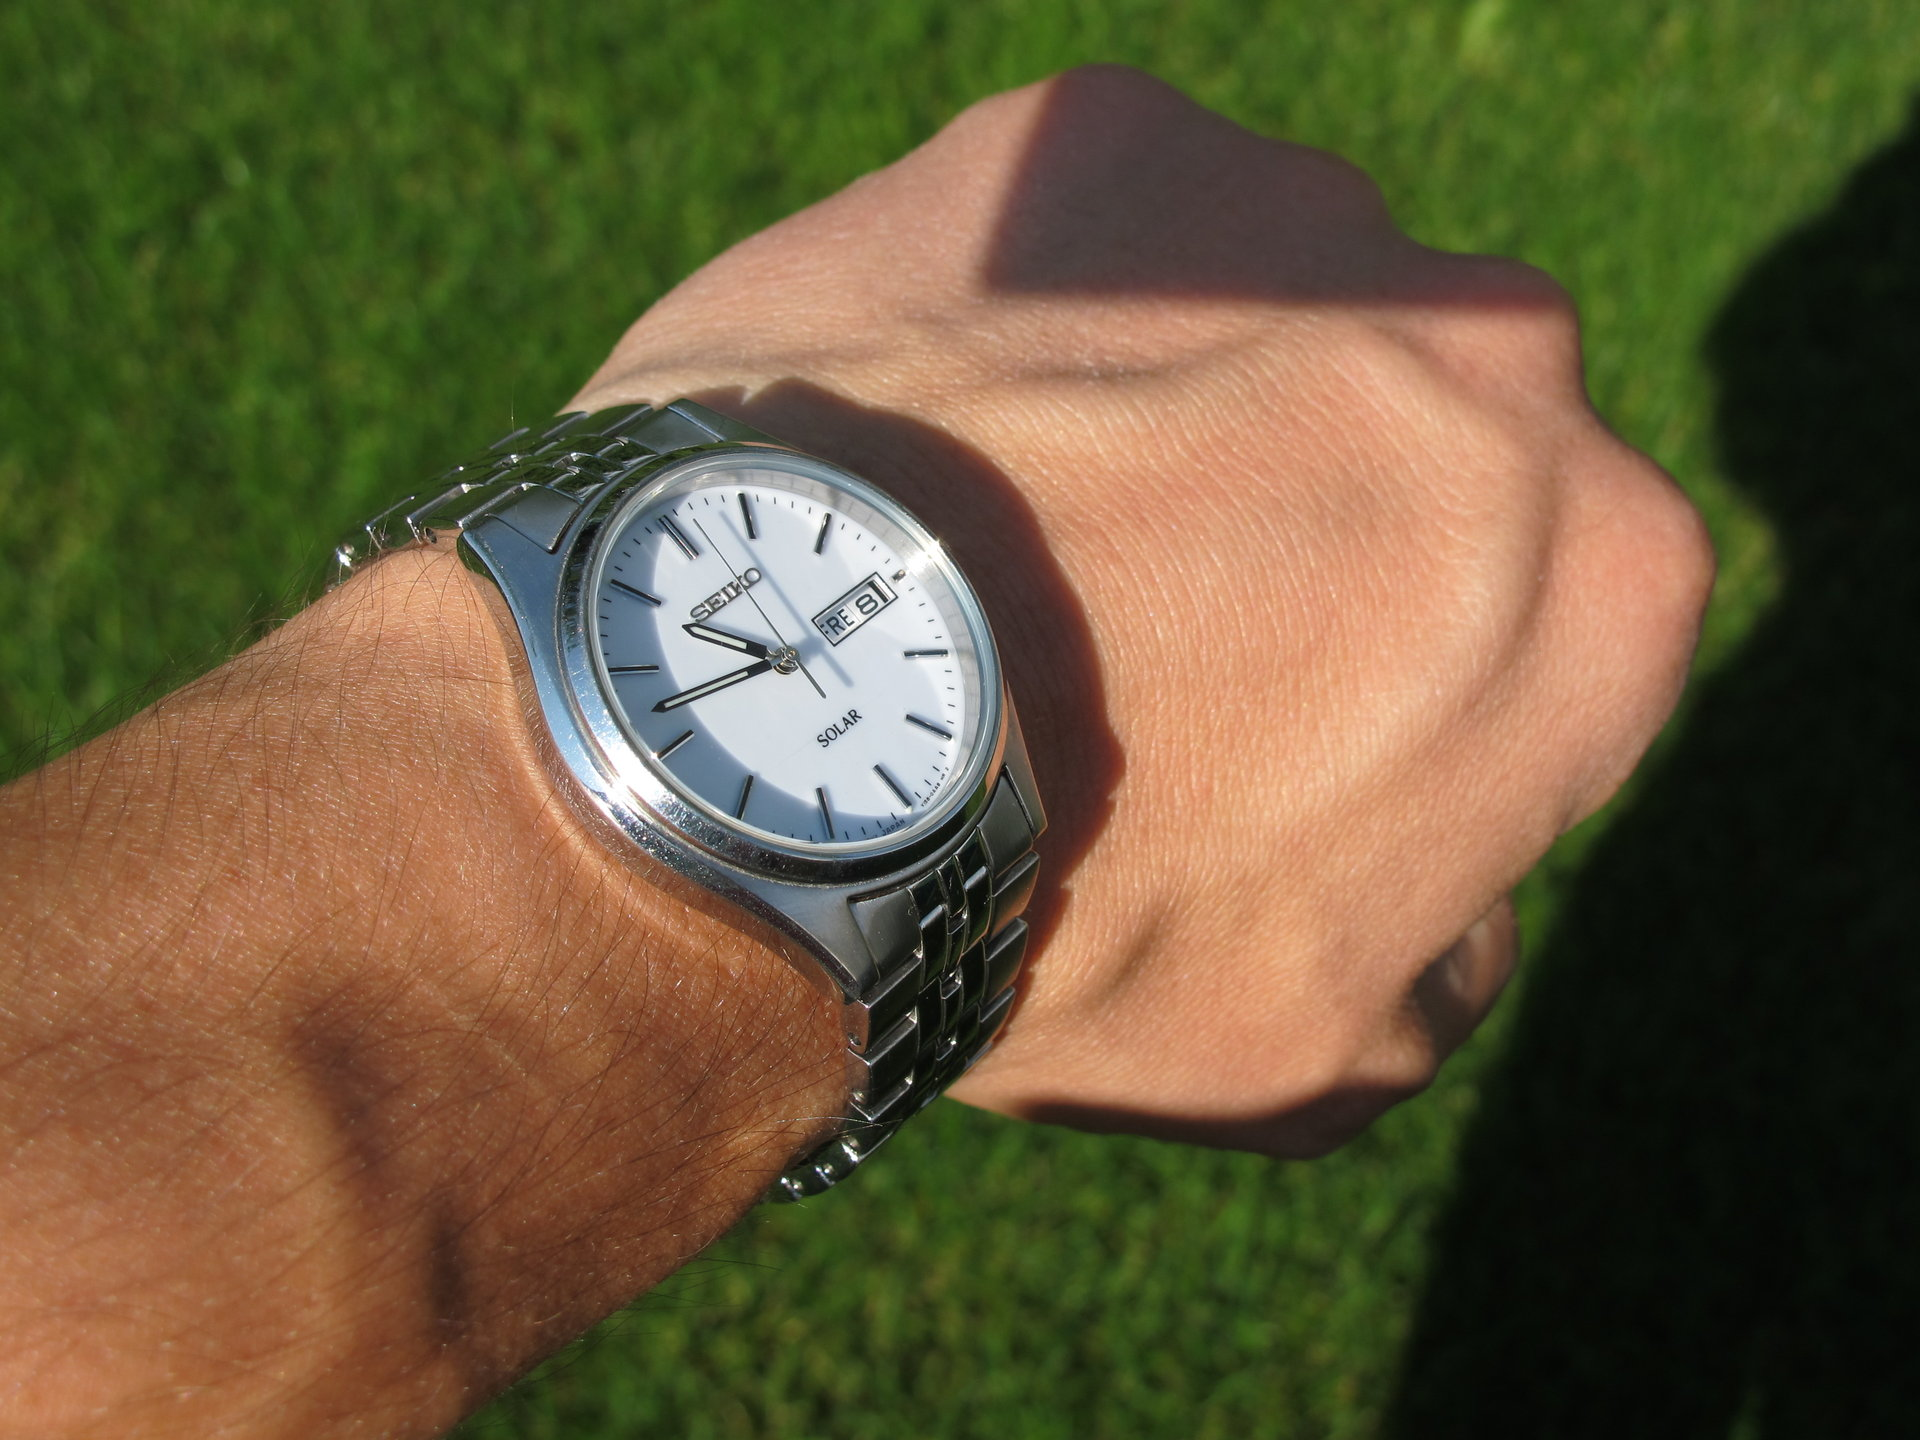 SNE031 on the wrist